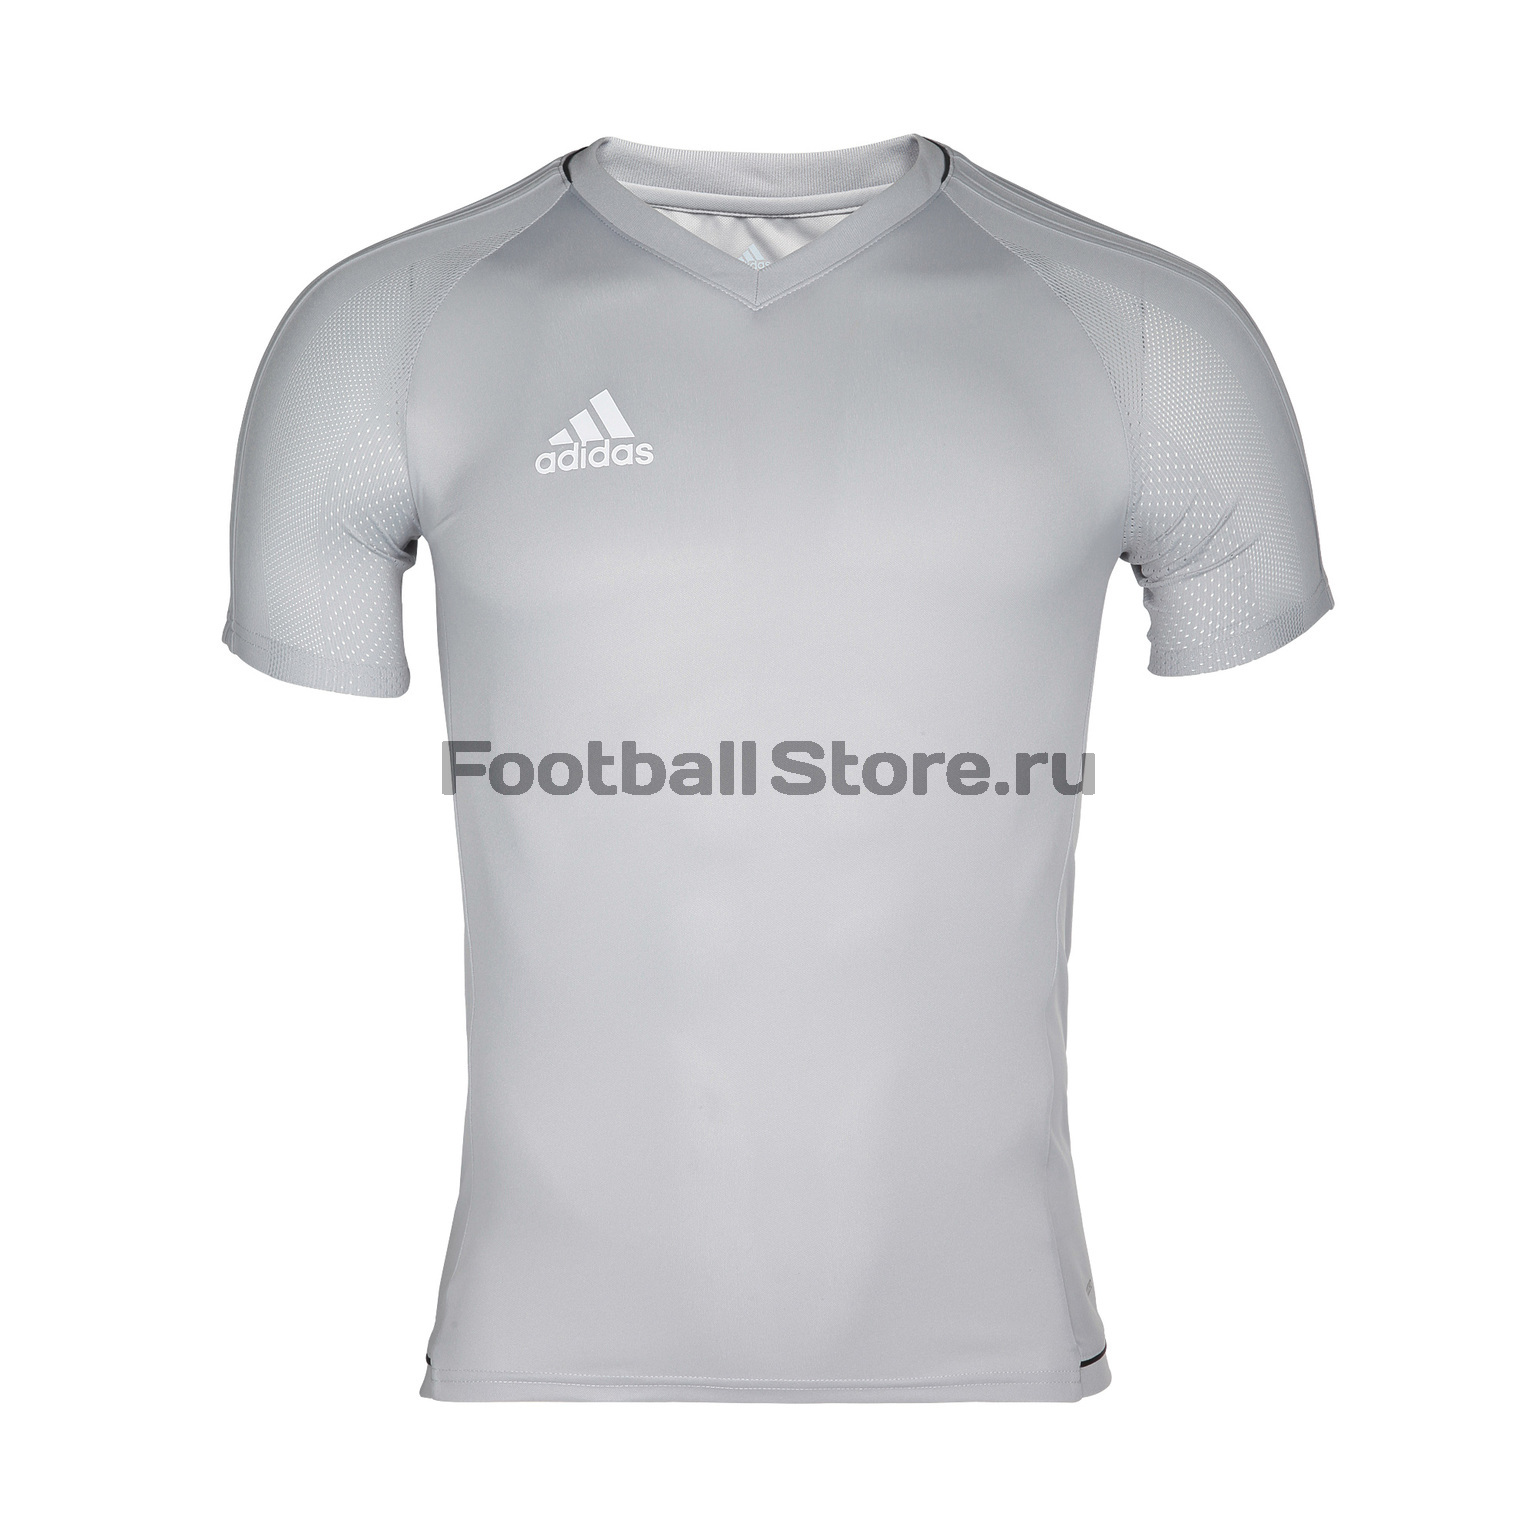 Футболка тренировочная Adidas Tiro17 TRG JSY BQ2806